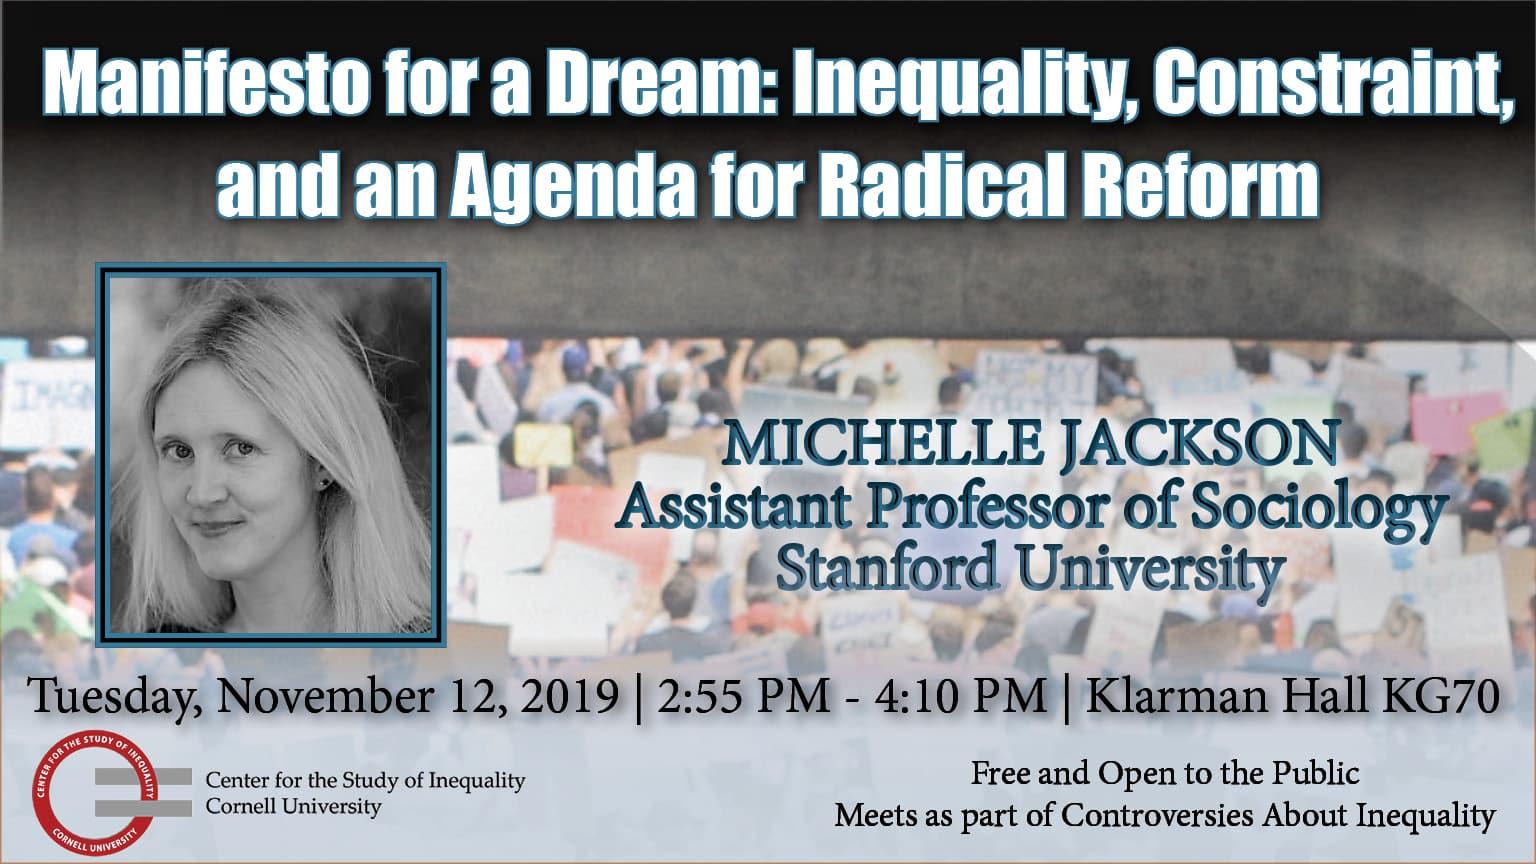 Michelle Jackson Event PowerPoint slide